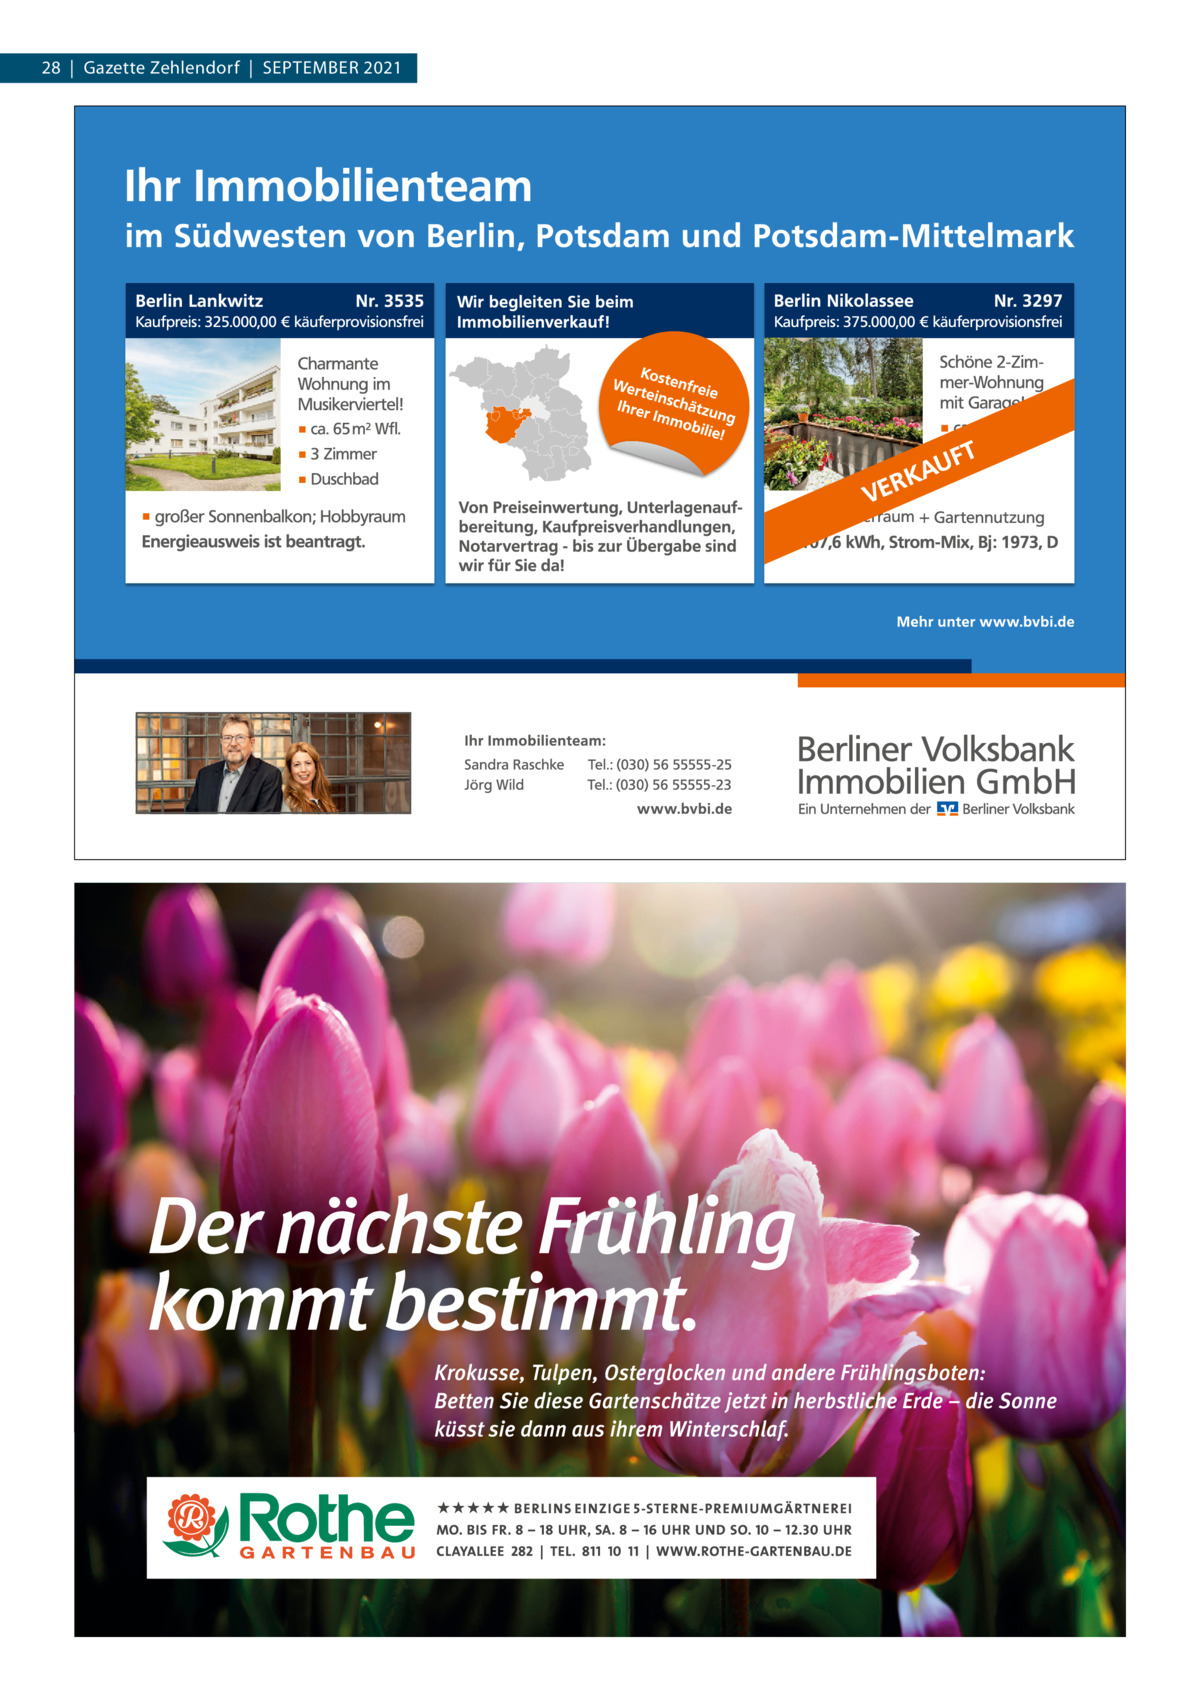 28|Gazette Zehlendorf|September 2021